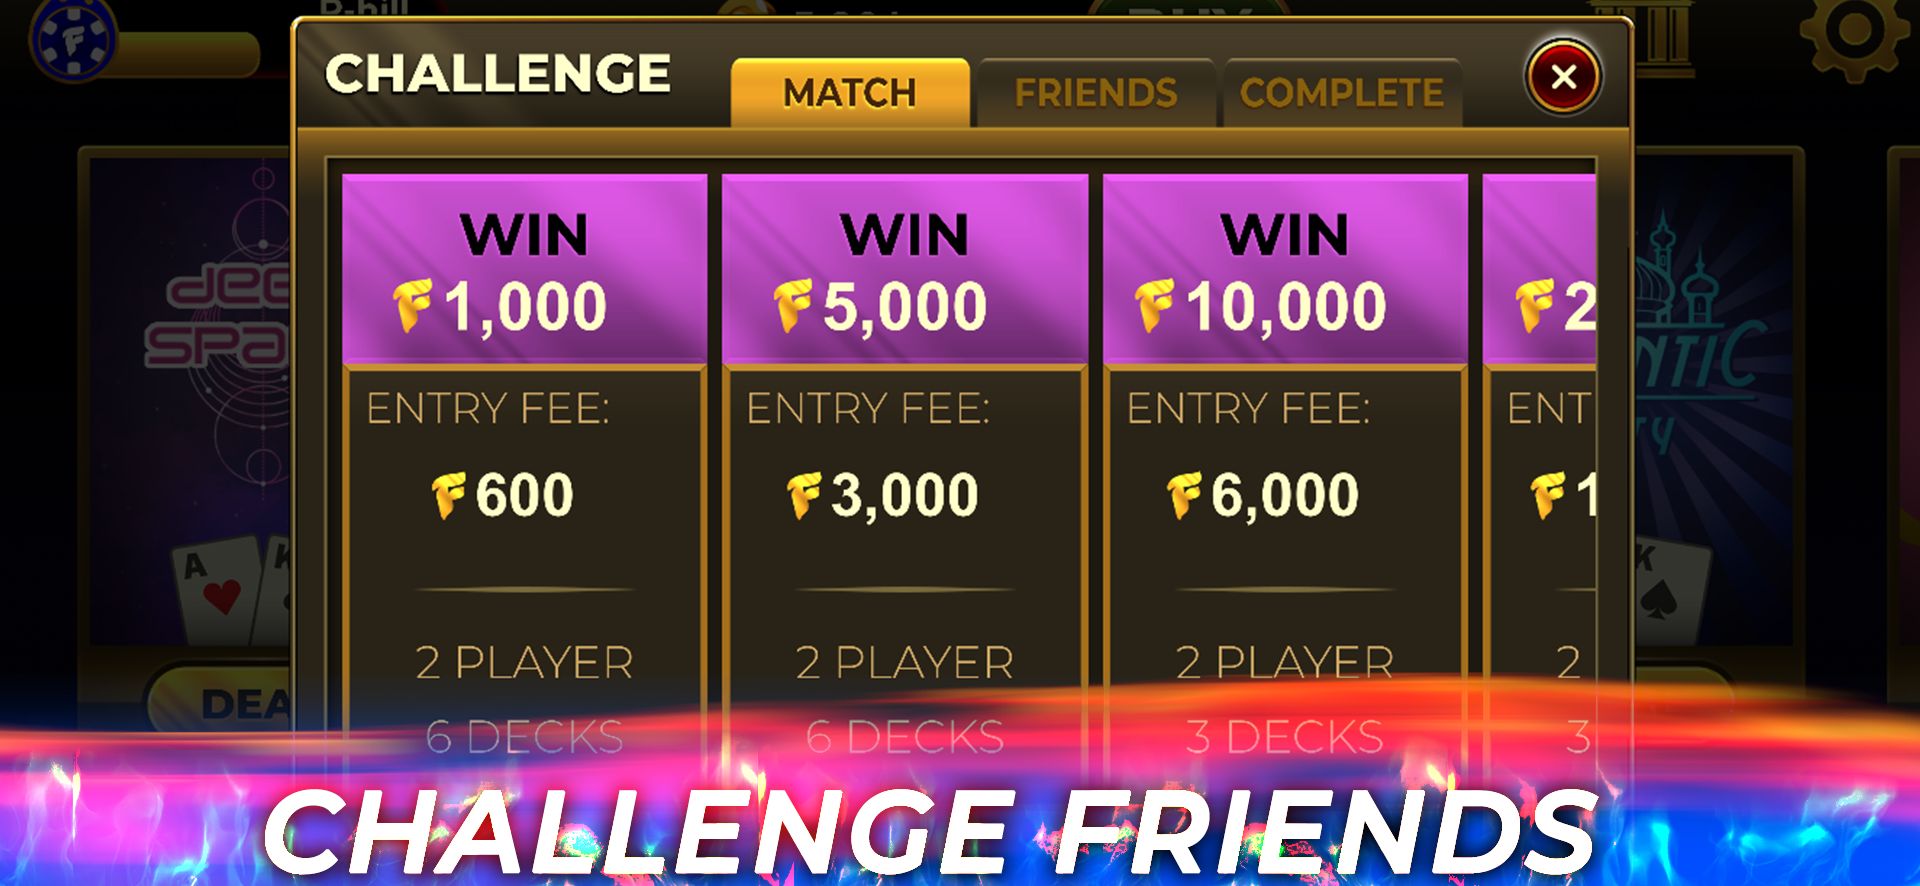 iphone6_5_challenge_screen.png